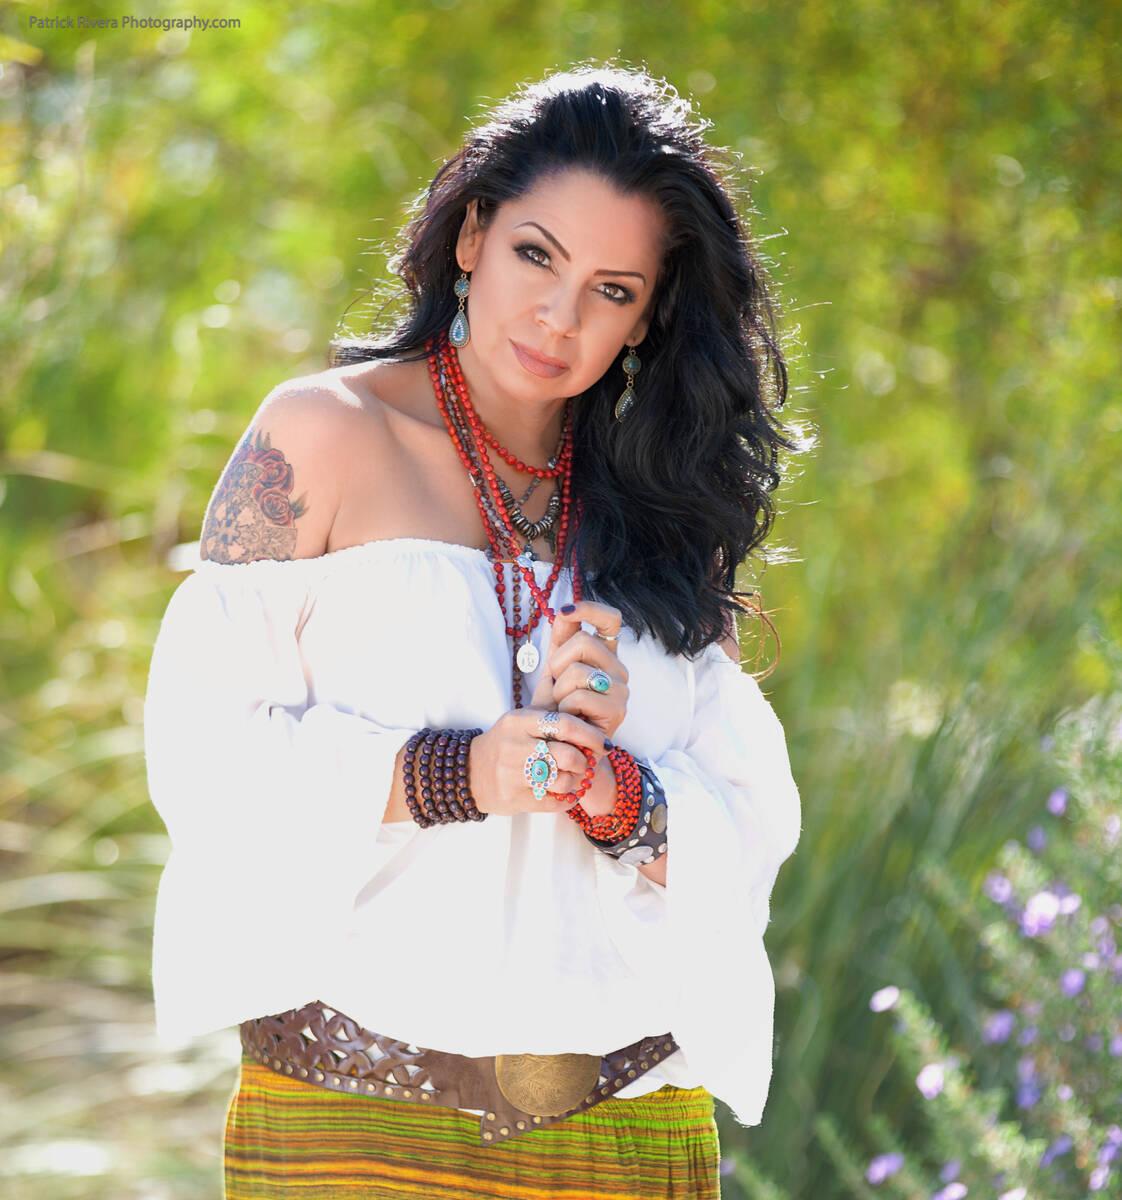 A promotional shot of New York-New York executive and longtime Vegas entertainer Stephanie Sanc ...